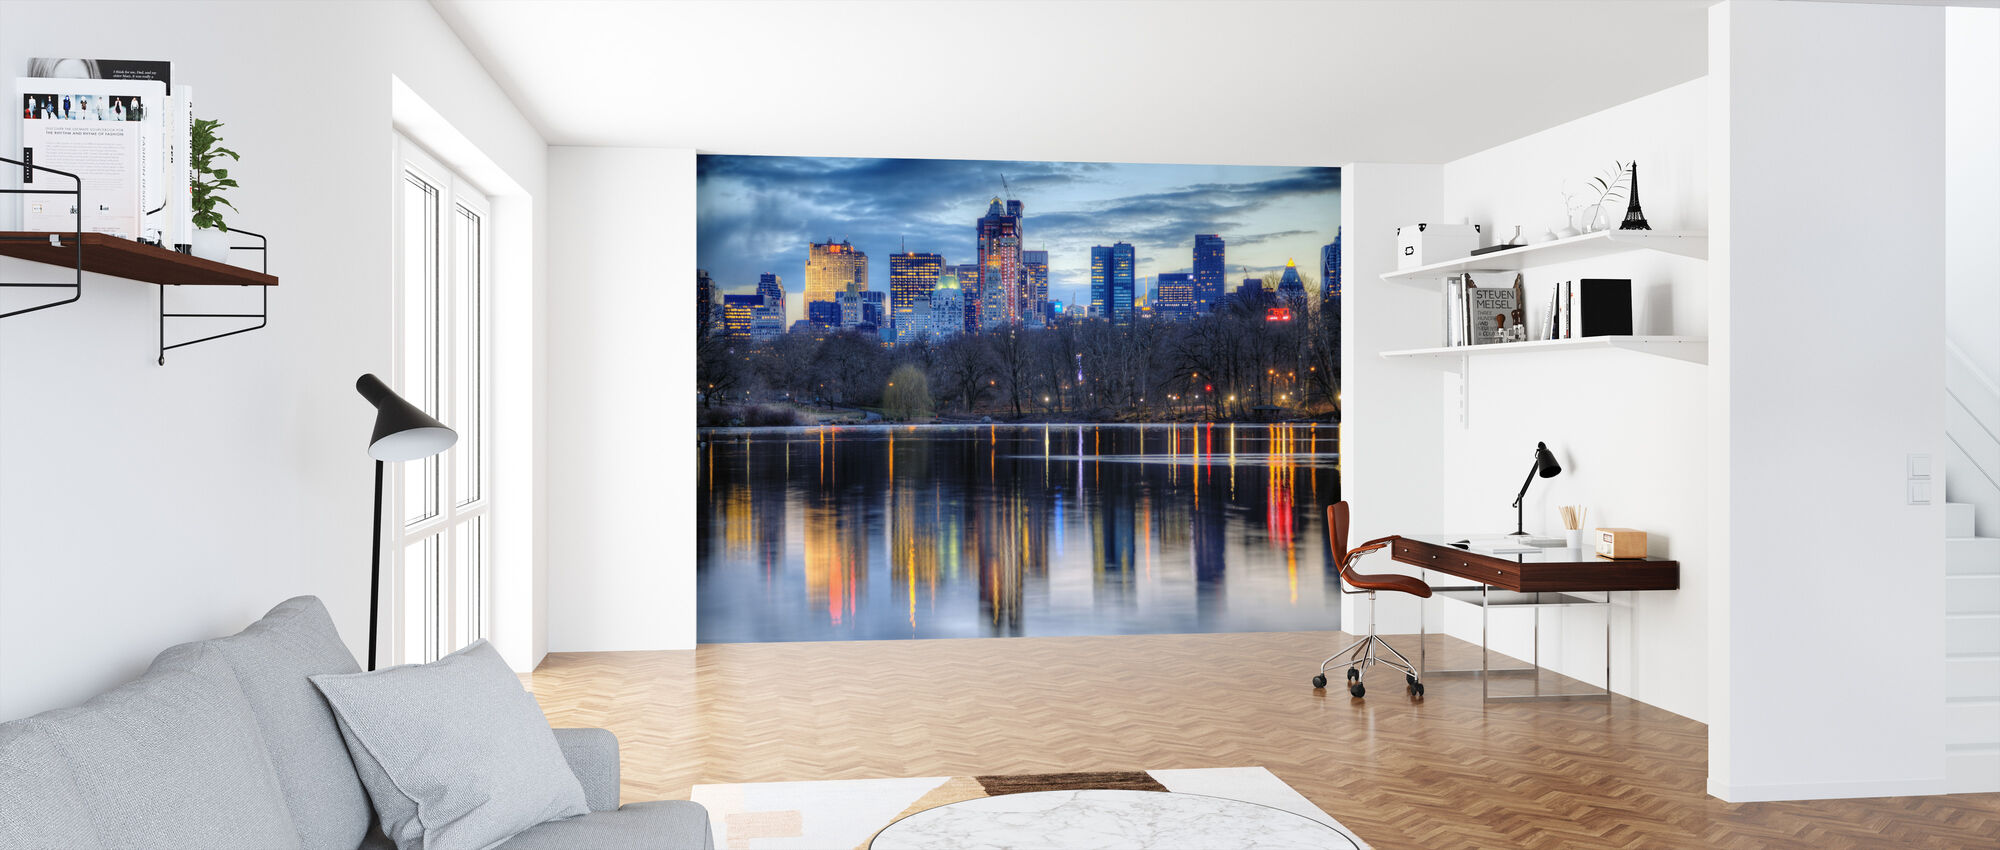 New York Reflexions - Tapet - Kontor